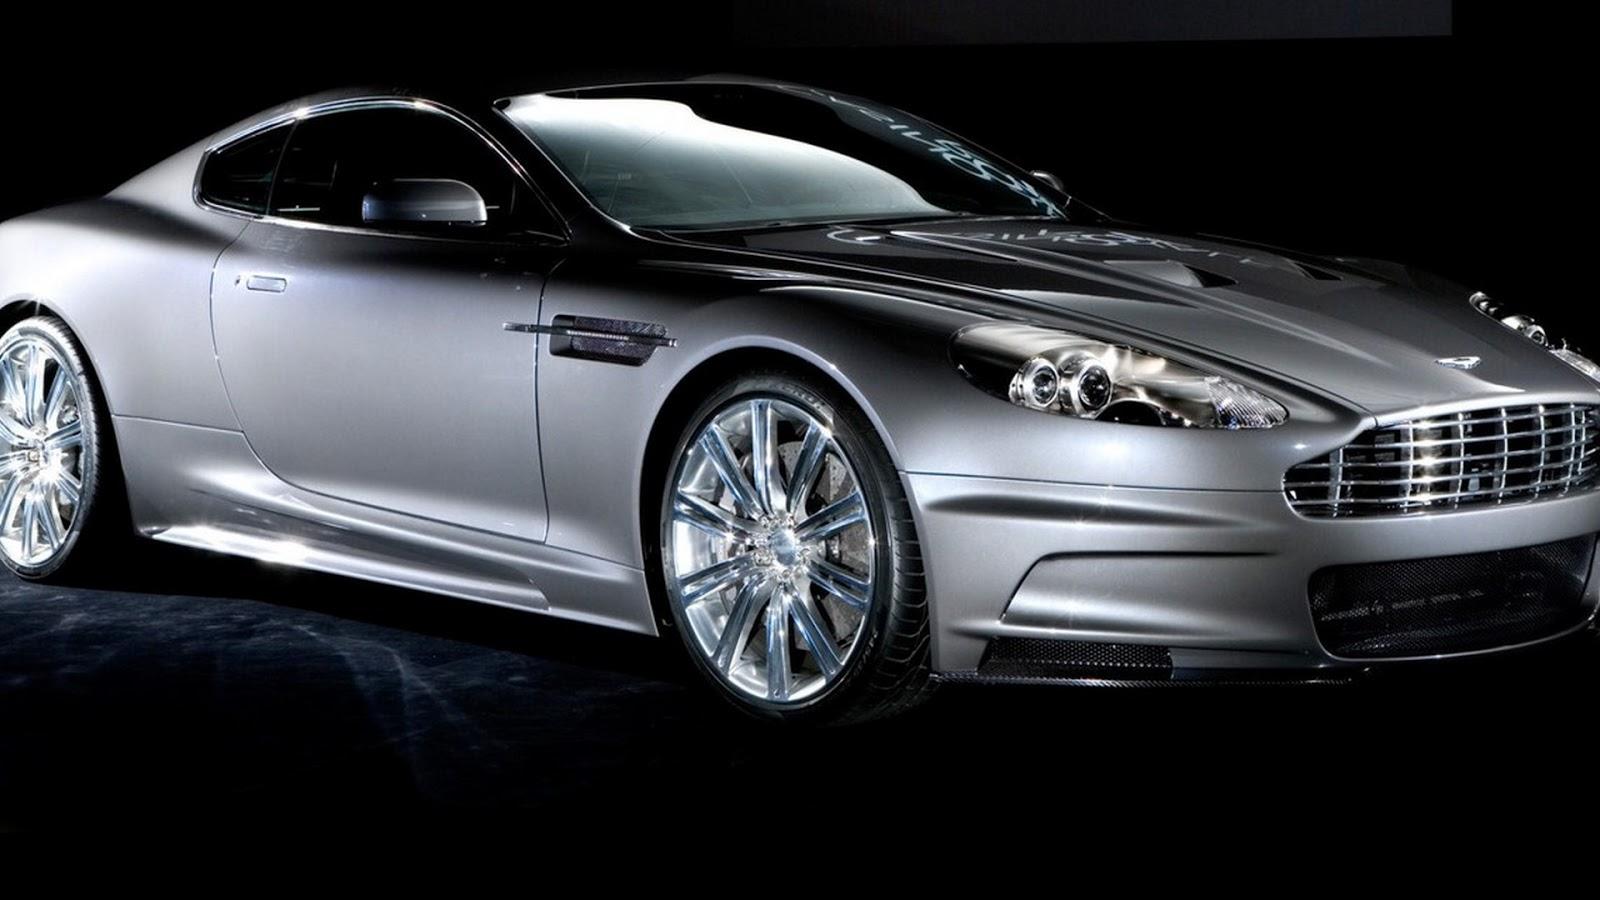 HD WALLPAPER: Aston Martin Db5 James Bond HD Wallpapers